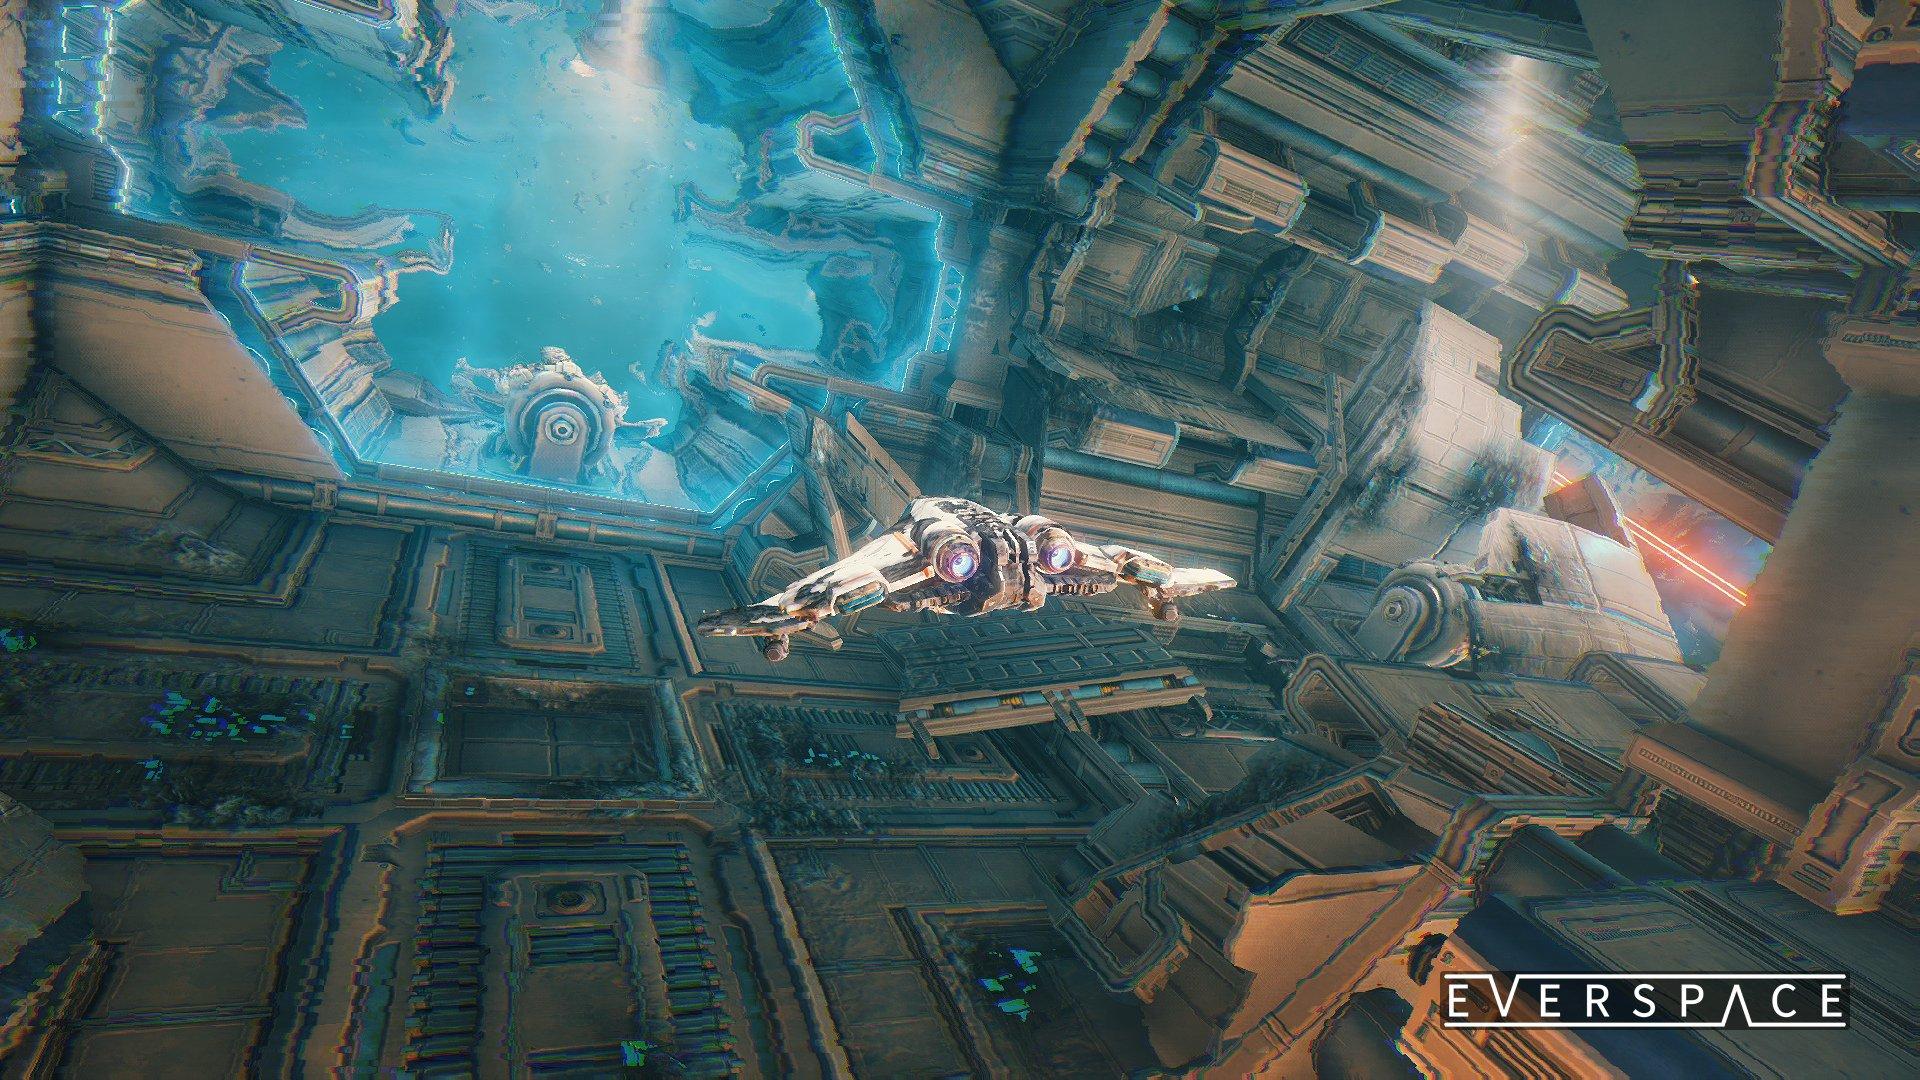 Análisis de Everspace para PC - 3DJuegos